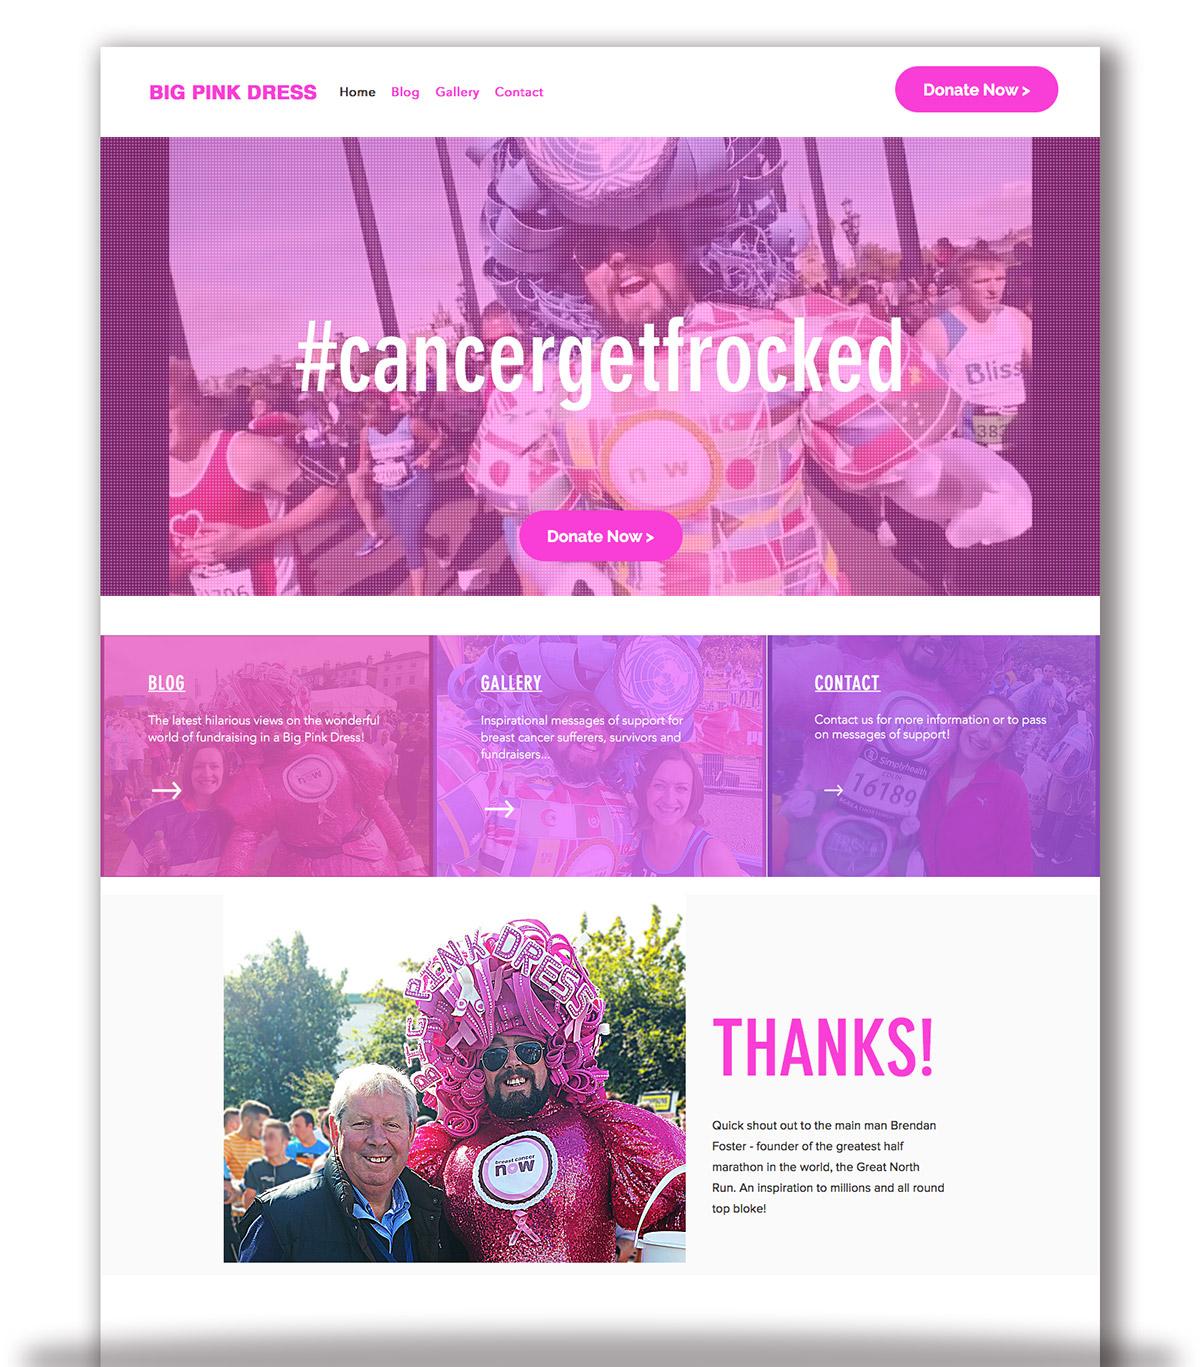 Big Pink Dress - website homepage - THAT Branding Company - Creative Design and Branding Agency in Newcastle and Gateshead.jpg